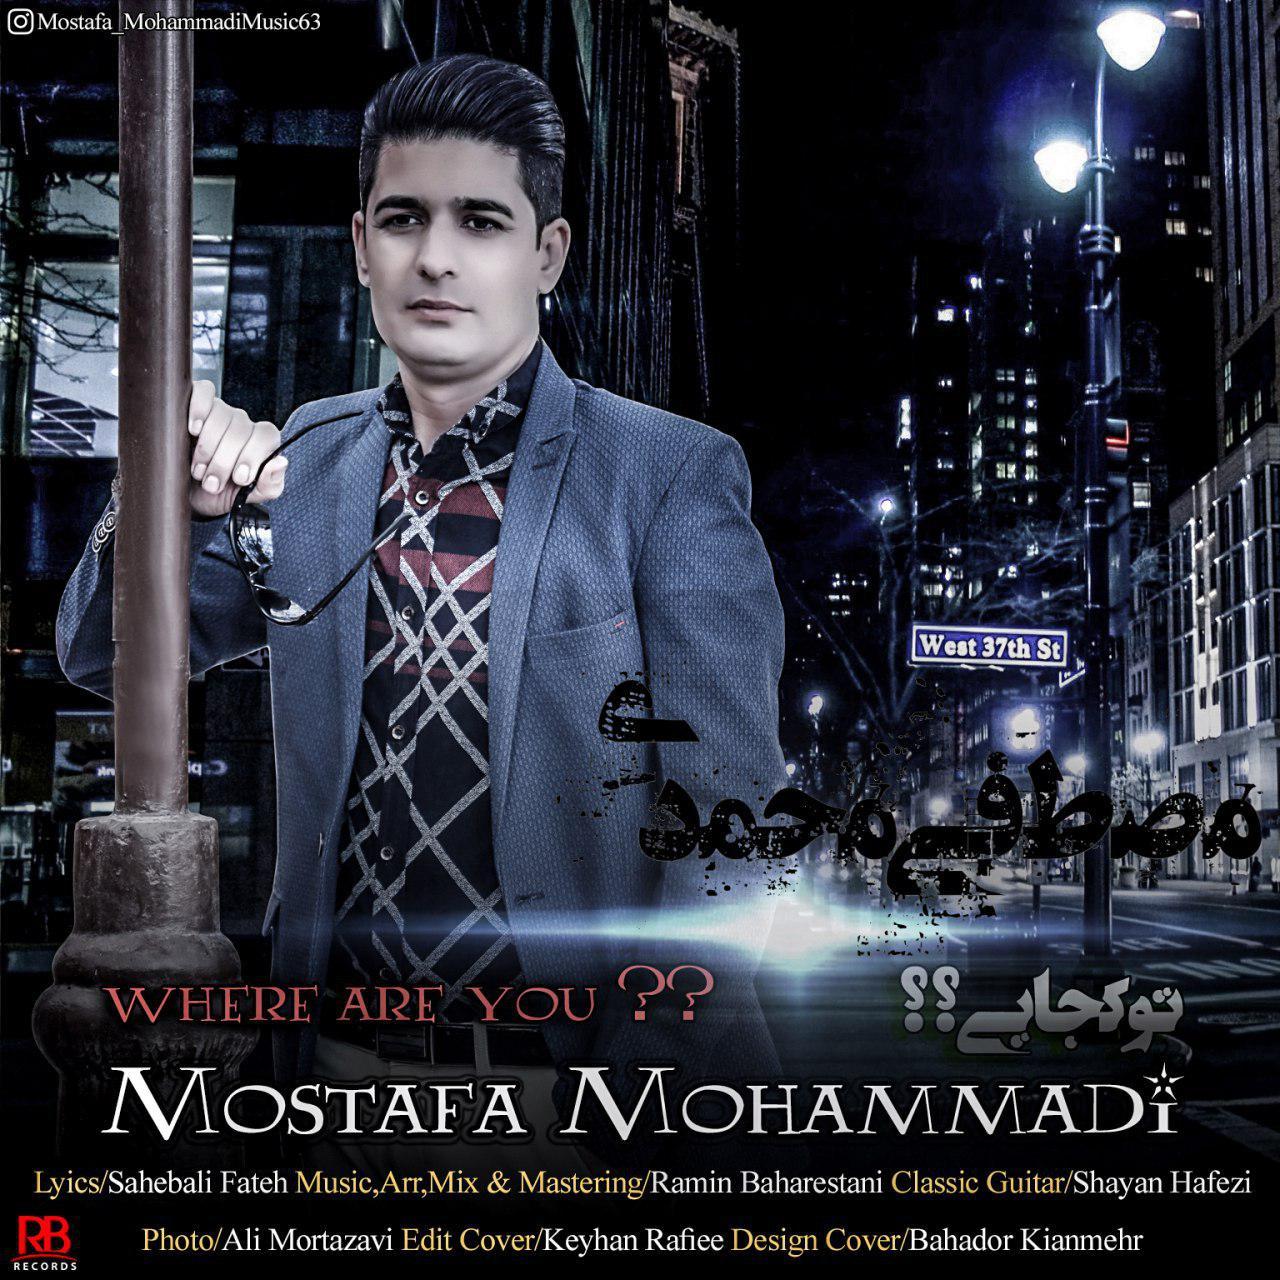 mostafa mohammadi to kojaee دانلود اهنگ تو کجایی مصطفی محمدی